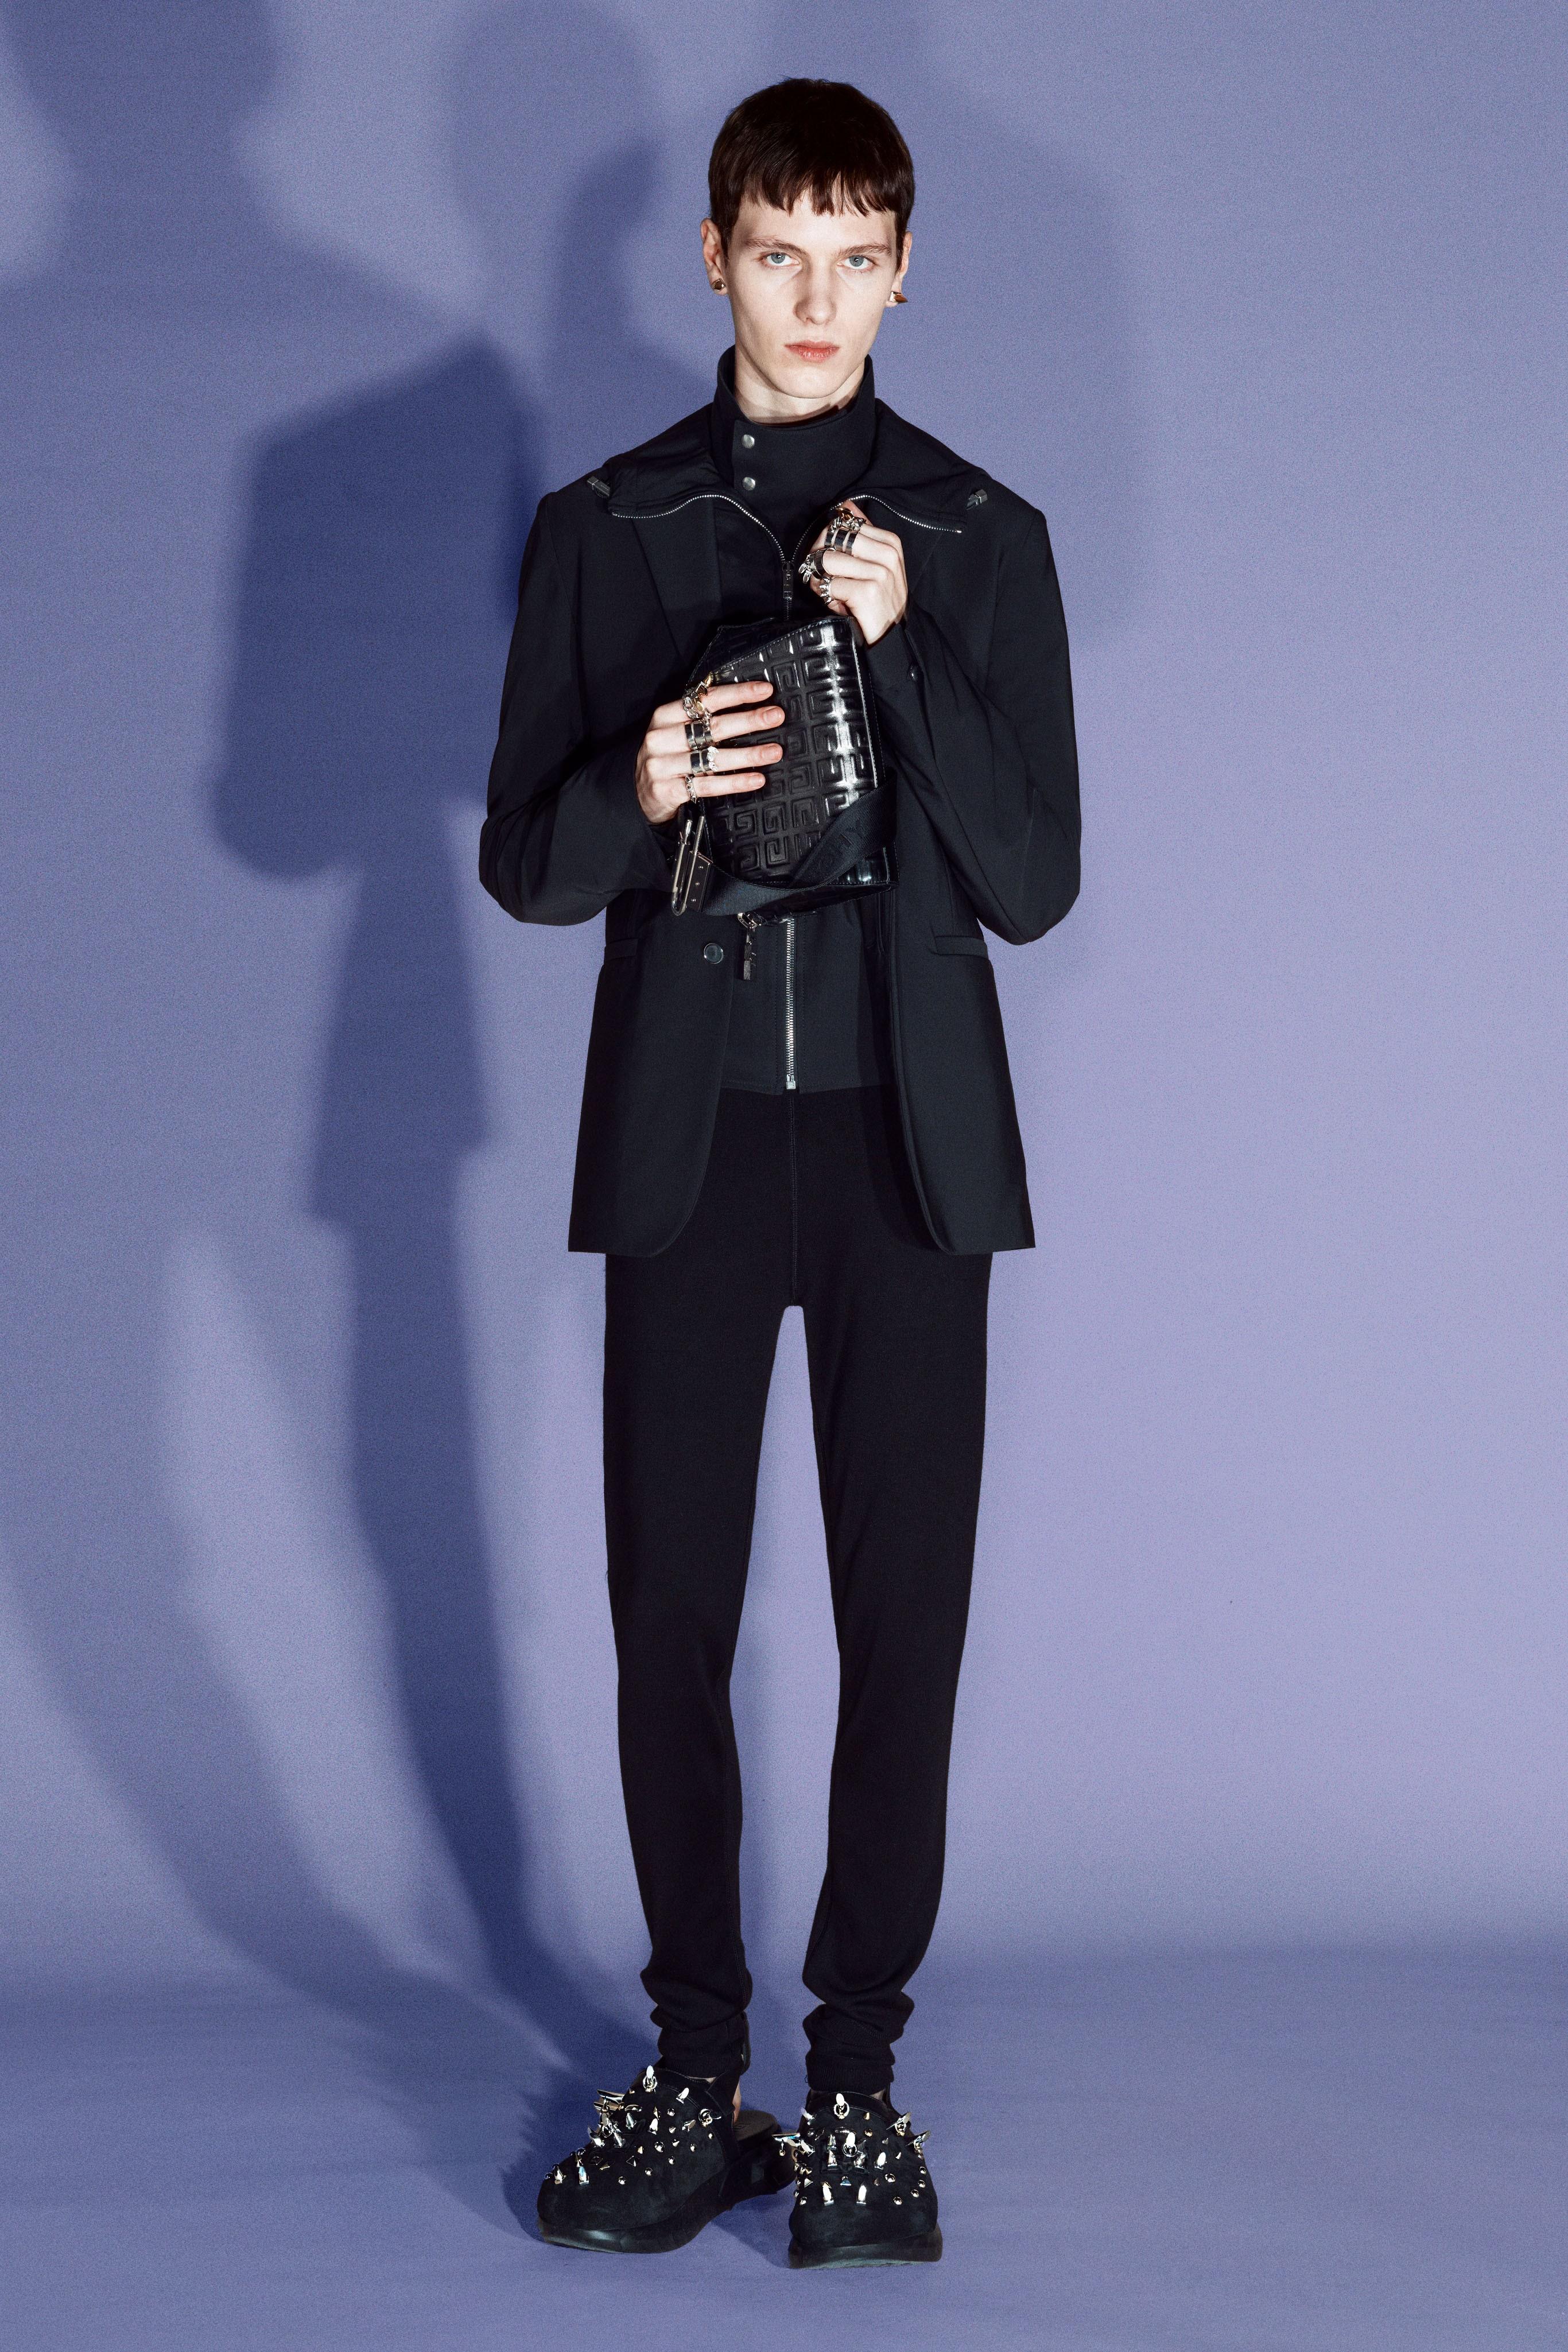 00012-Givenchy-Pre-Fall-21